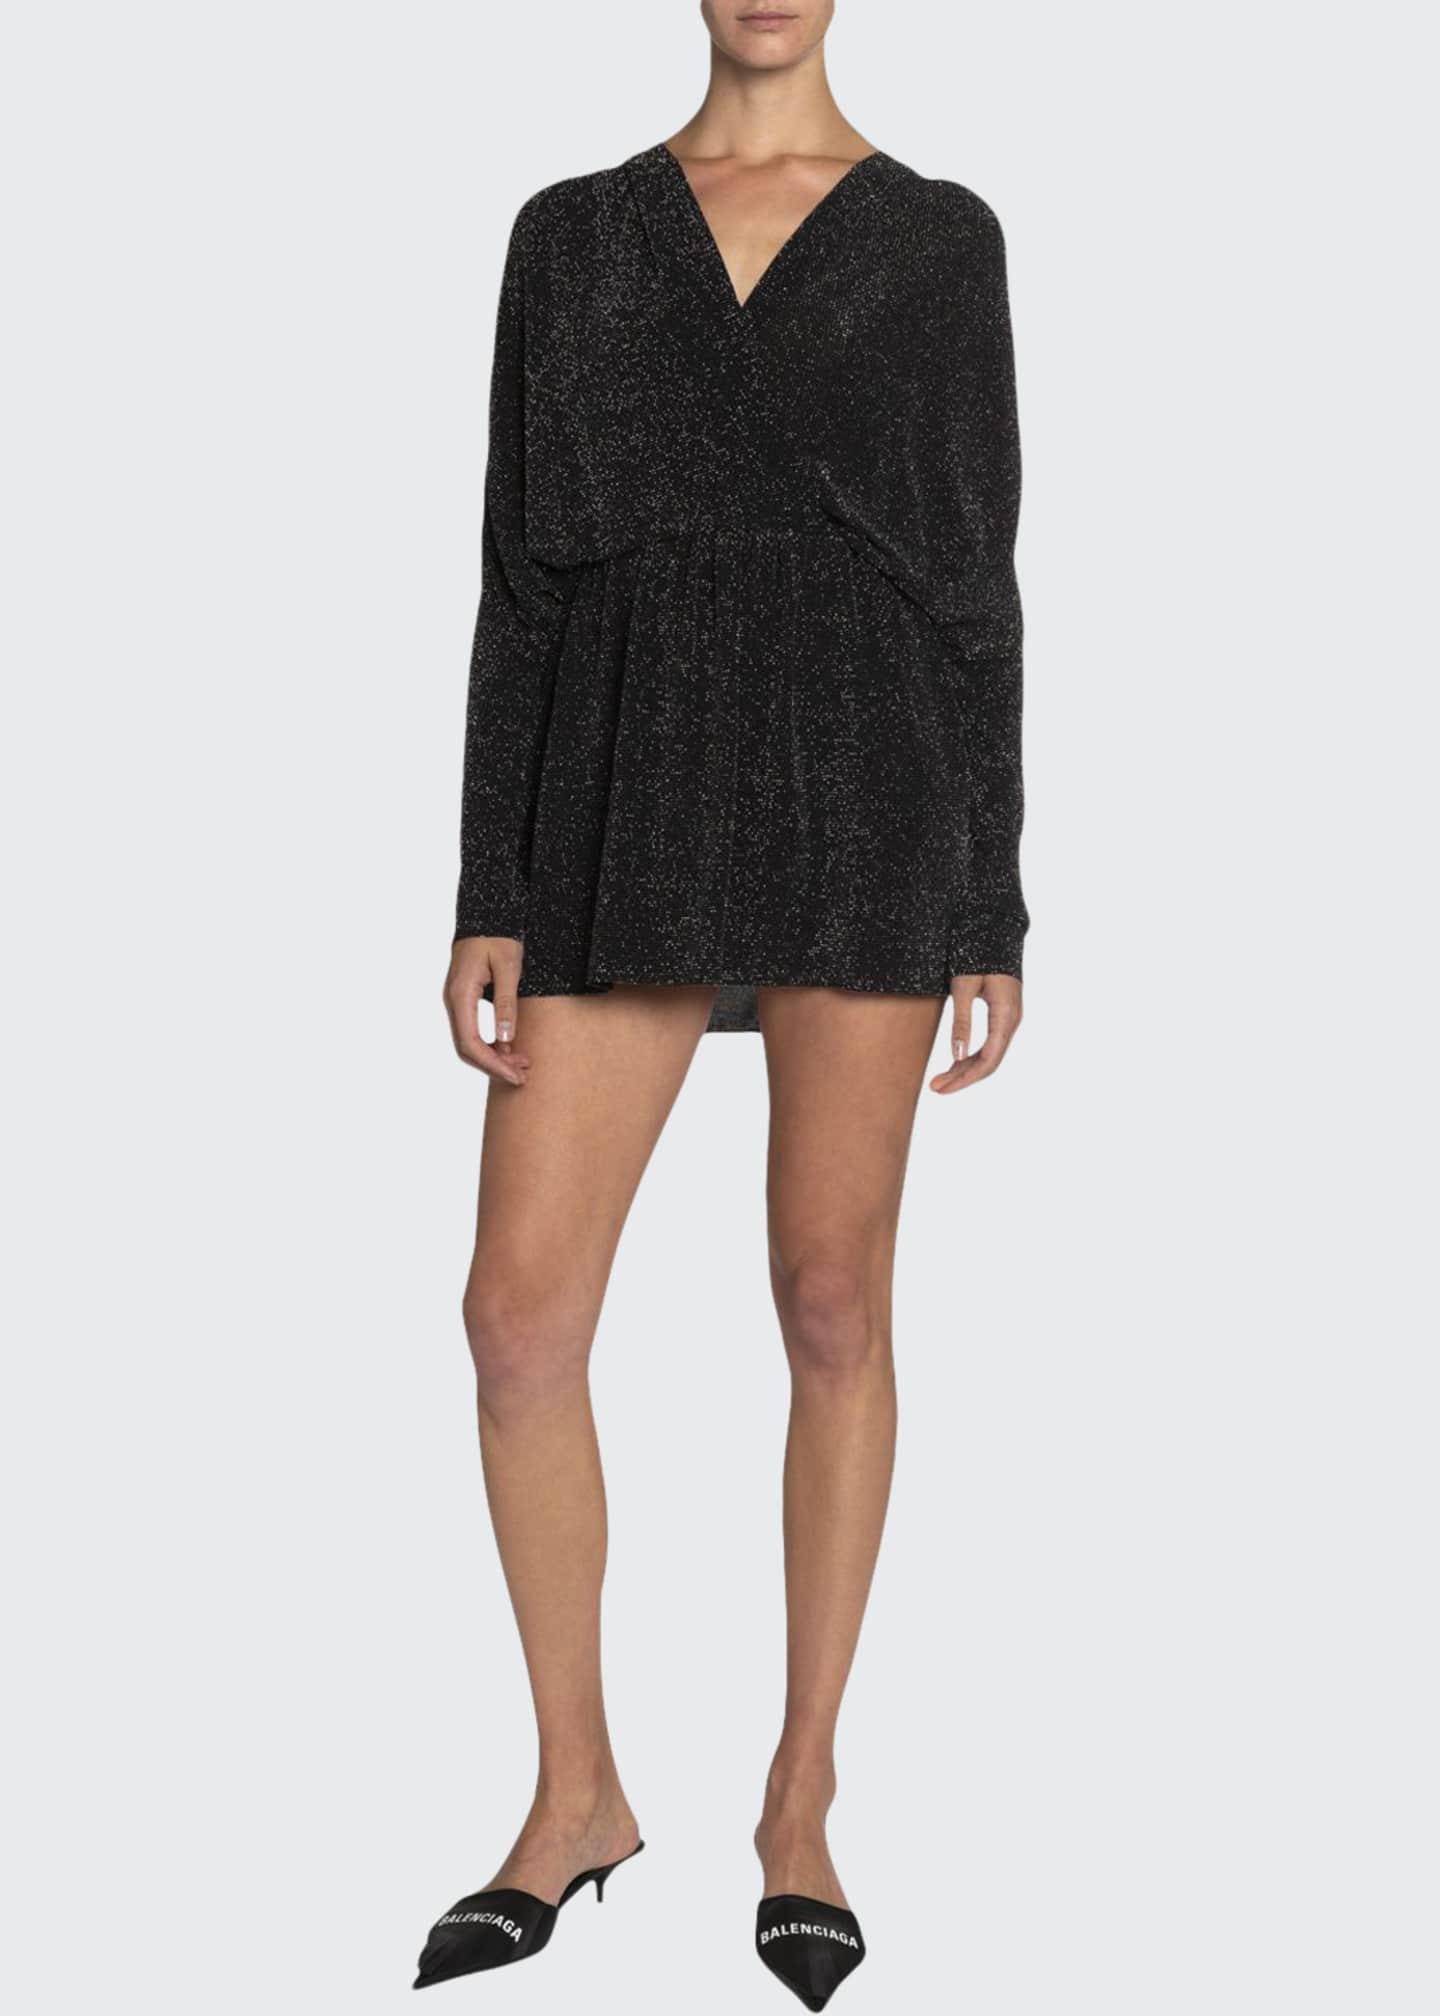 Balenciaga Metallic Jersey V-Neck Mini Dress